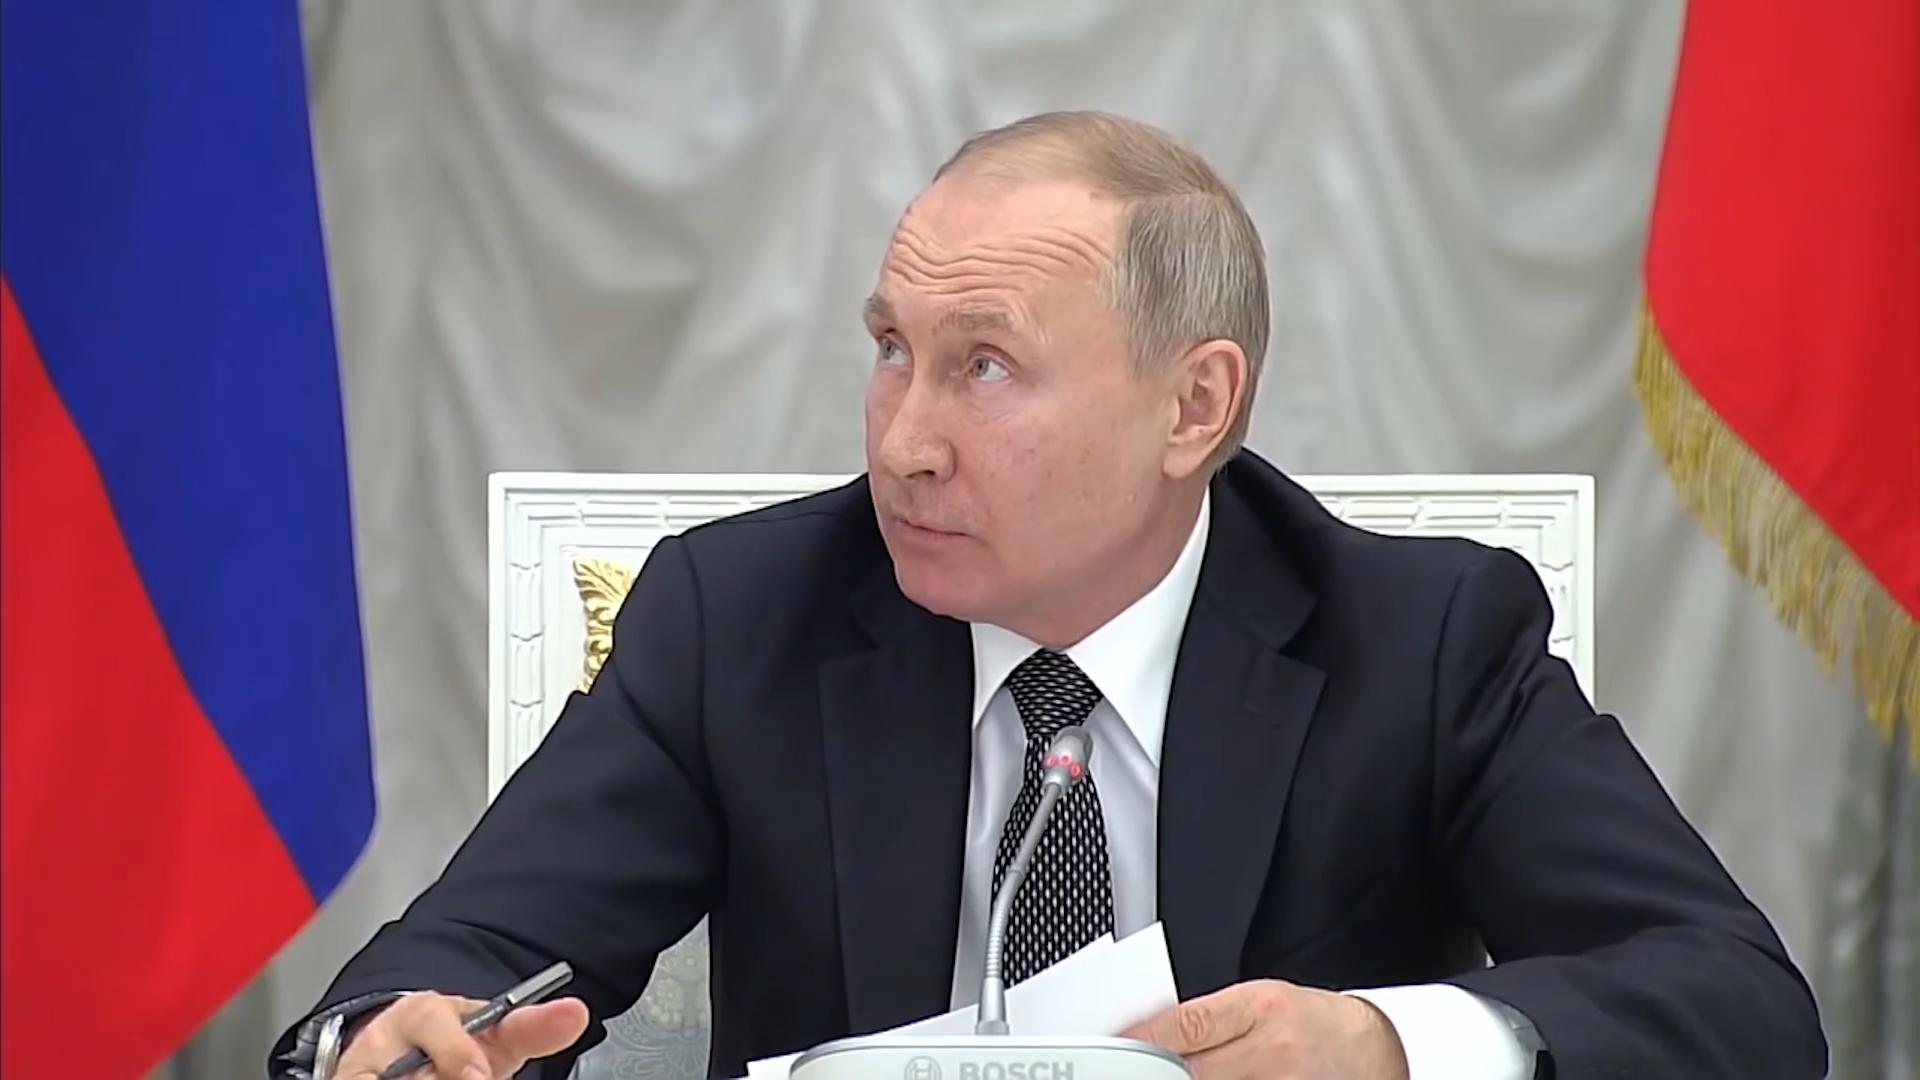 20200229_09-00-Путин сказал, куда он «уходит»-pic16